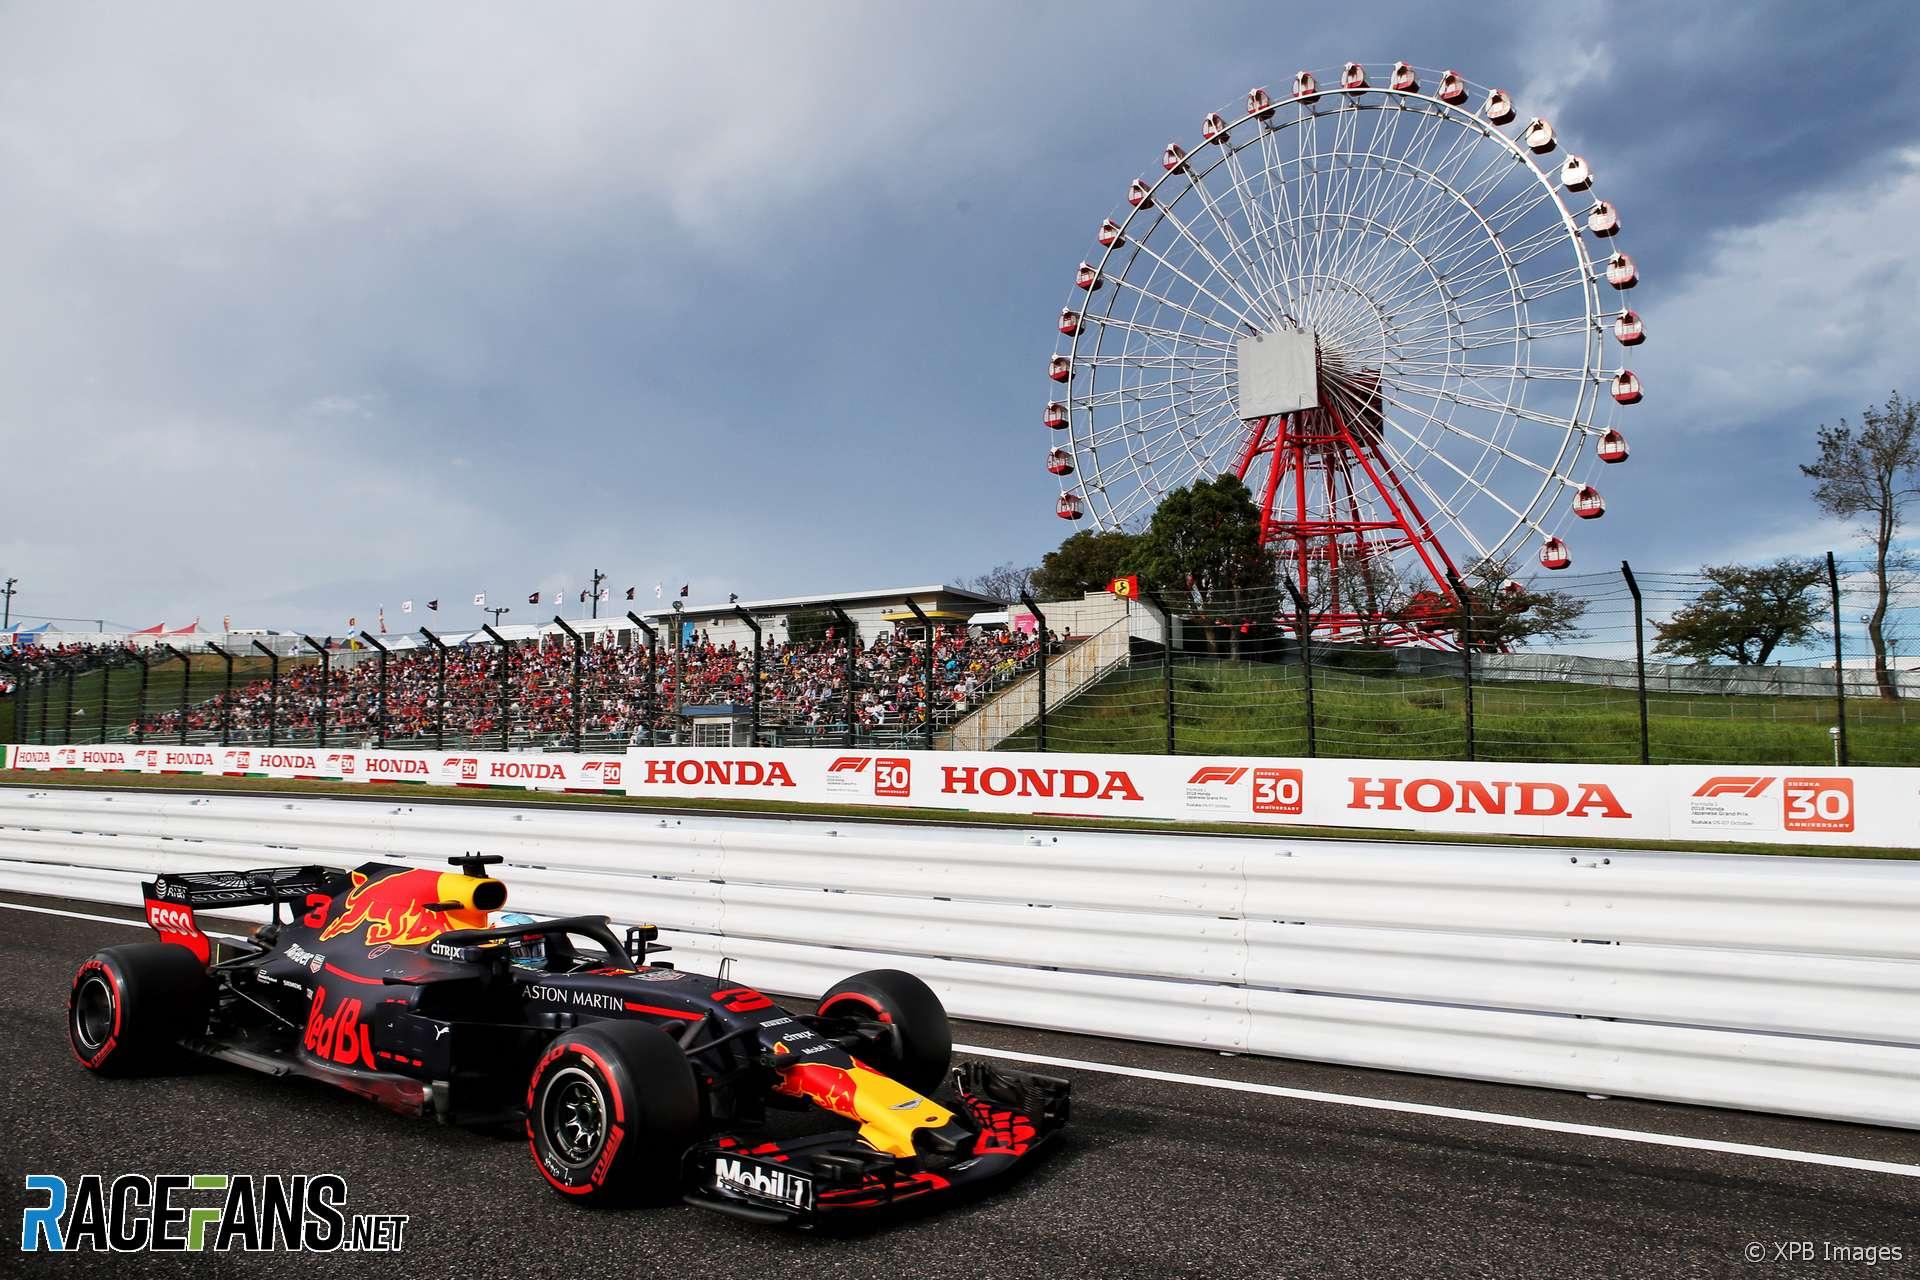 Daniel Ricciardo, Red Bull, Suzuka, 2018